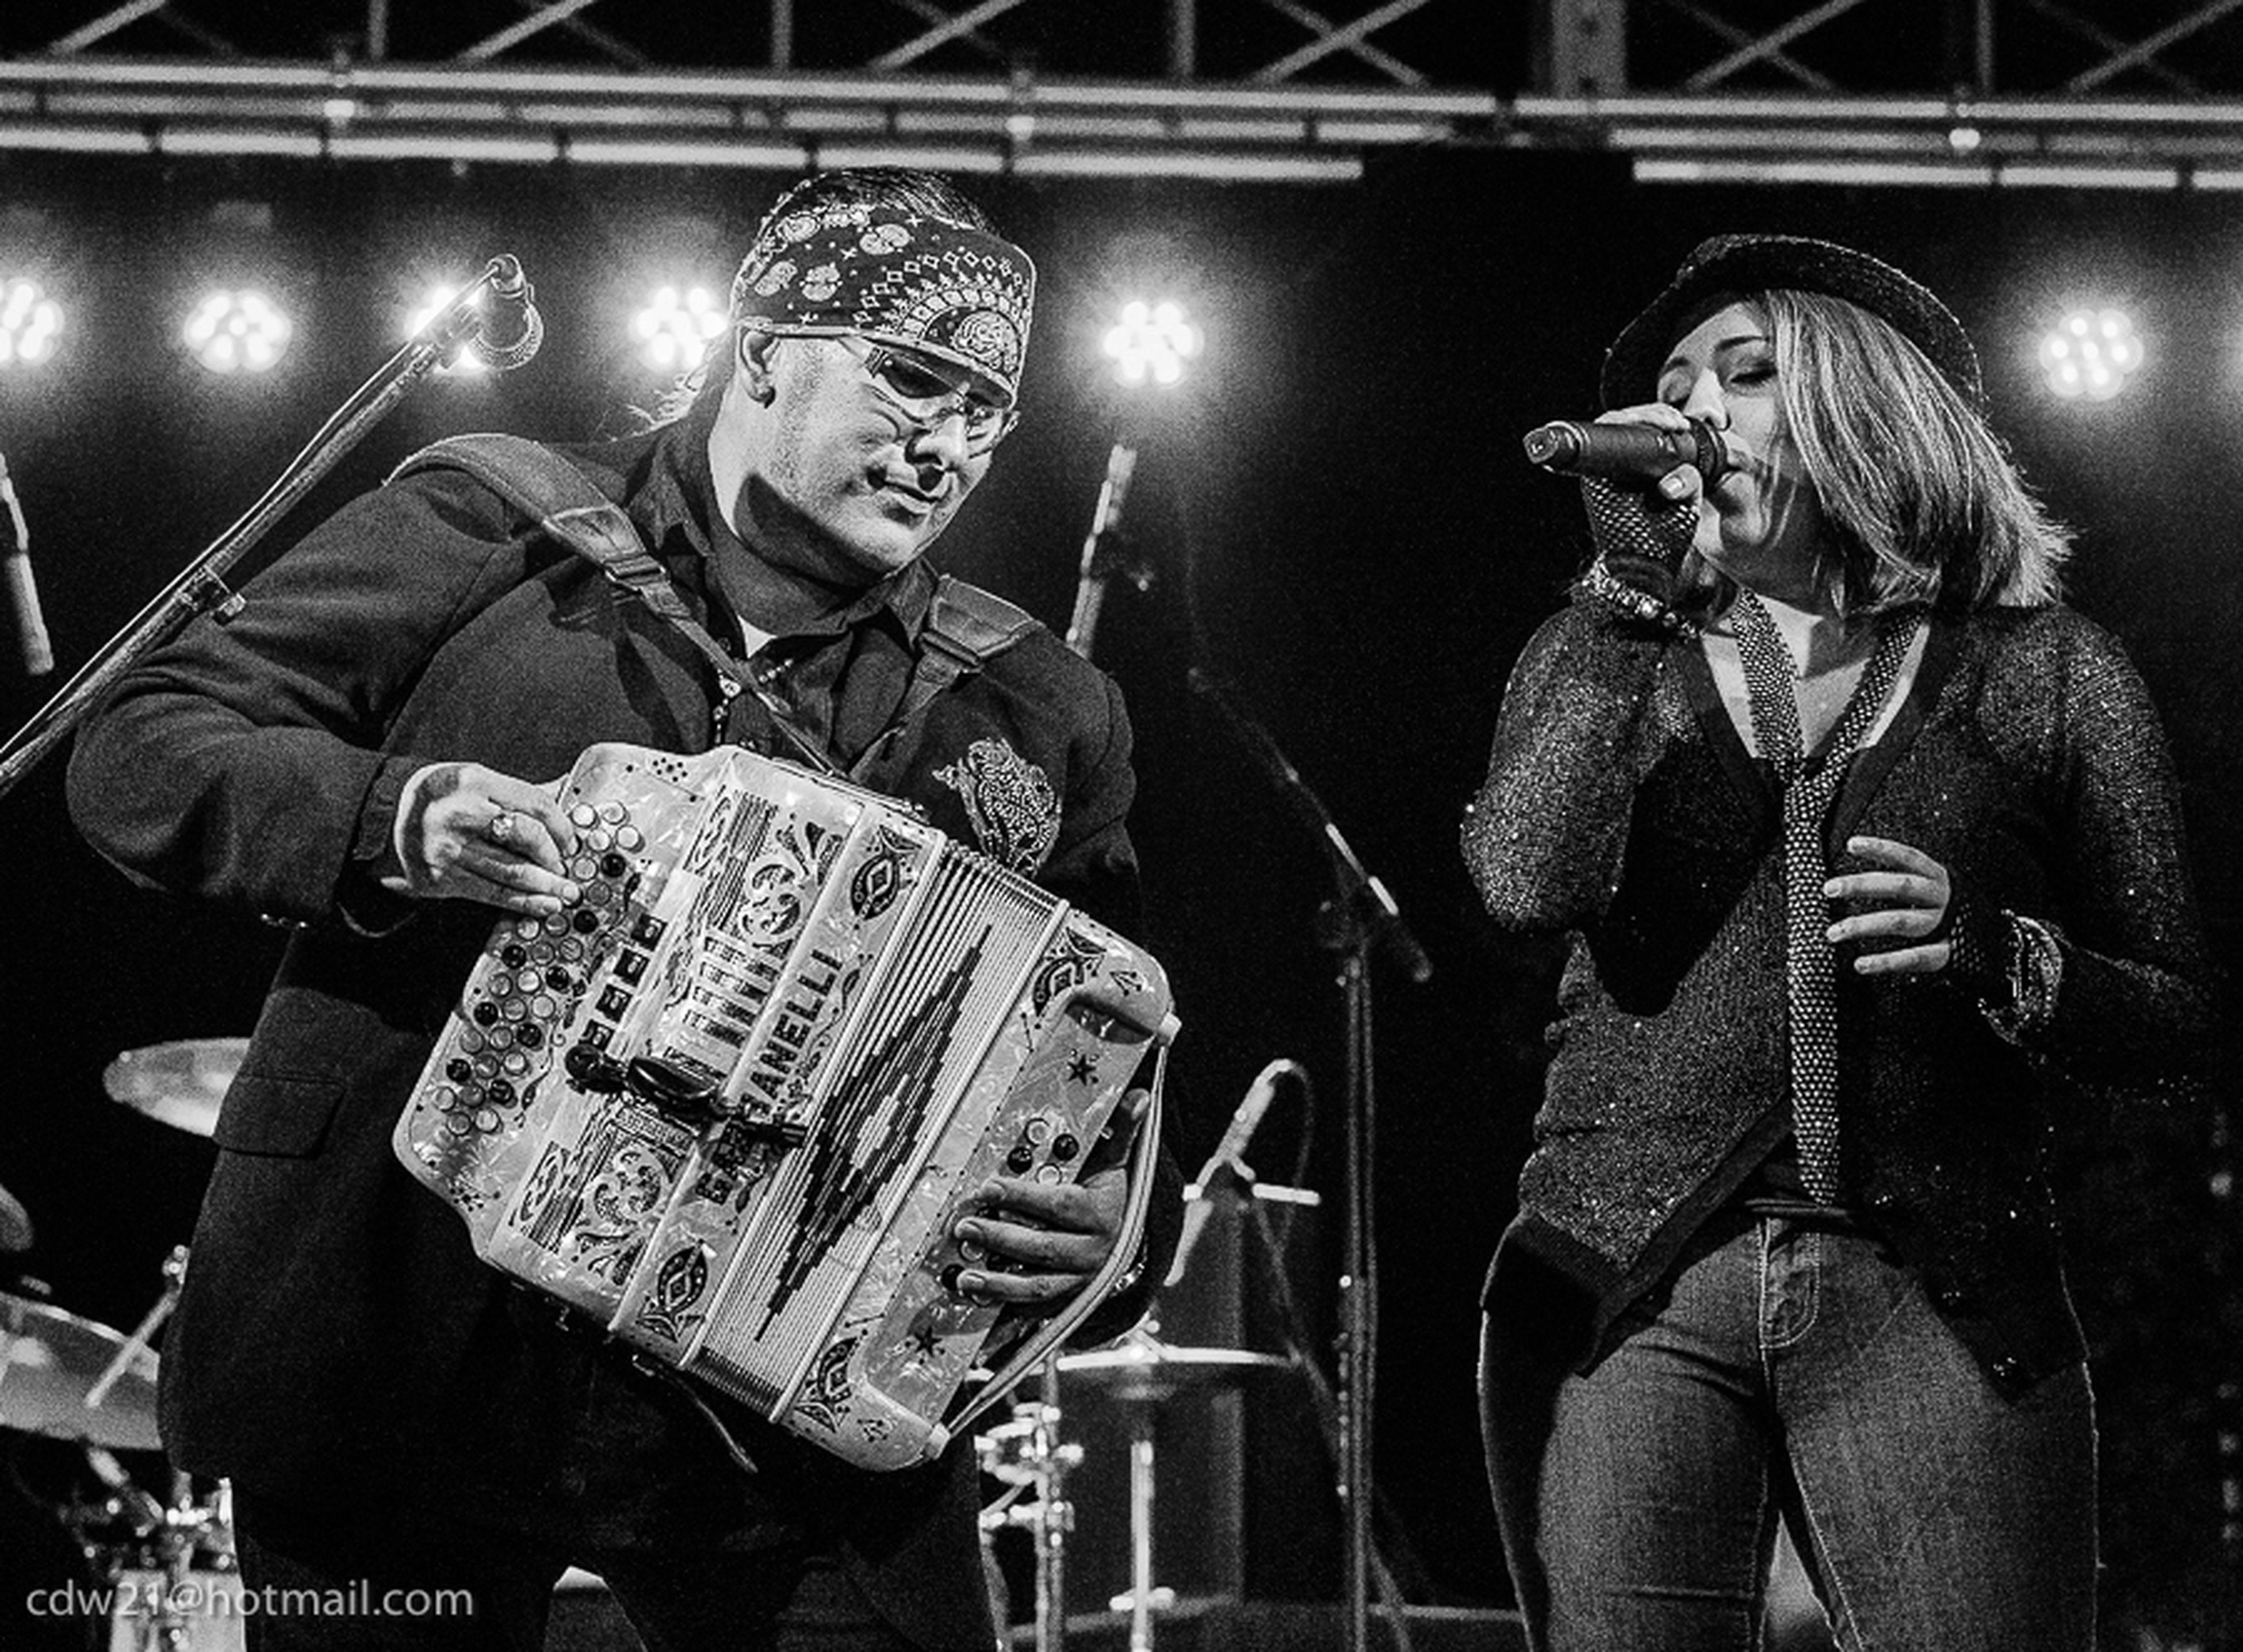 EyeEmTexas Event Photographer EyeEm Best Shots - Black + White Blackandwhite Photography Tejano Music Live Music Concert Photography Bloominfest Black&white Band